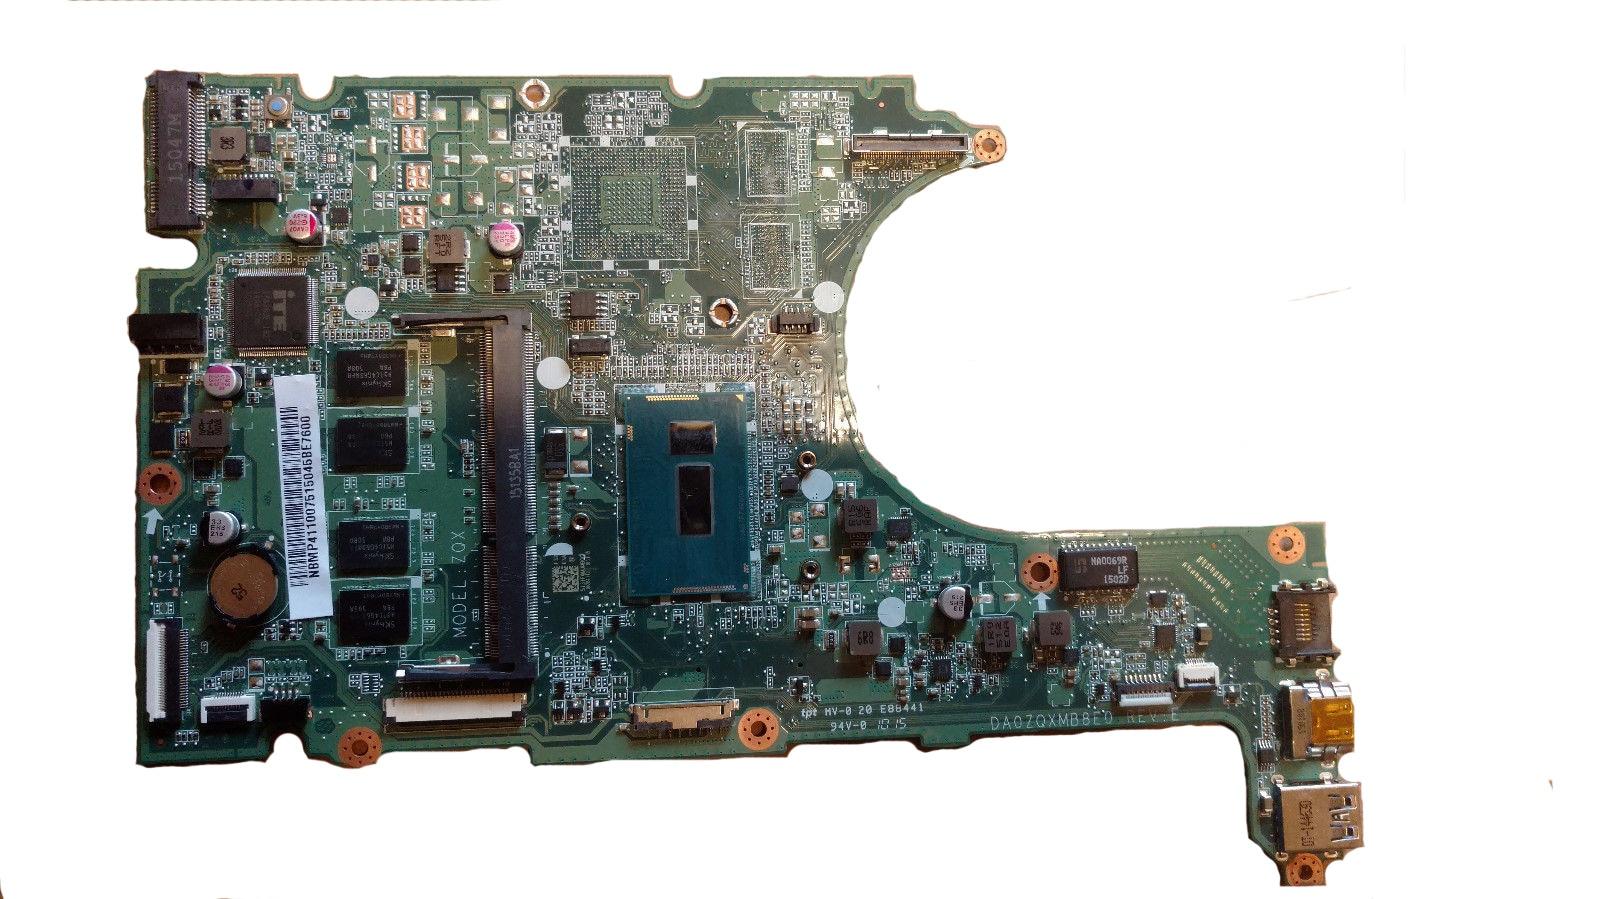 HOLYTIME Laptop Motherboard For font b Acer b font Aspire R3 471T DA0ZQXMB8E0 NBMP411003 SR1EF I5